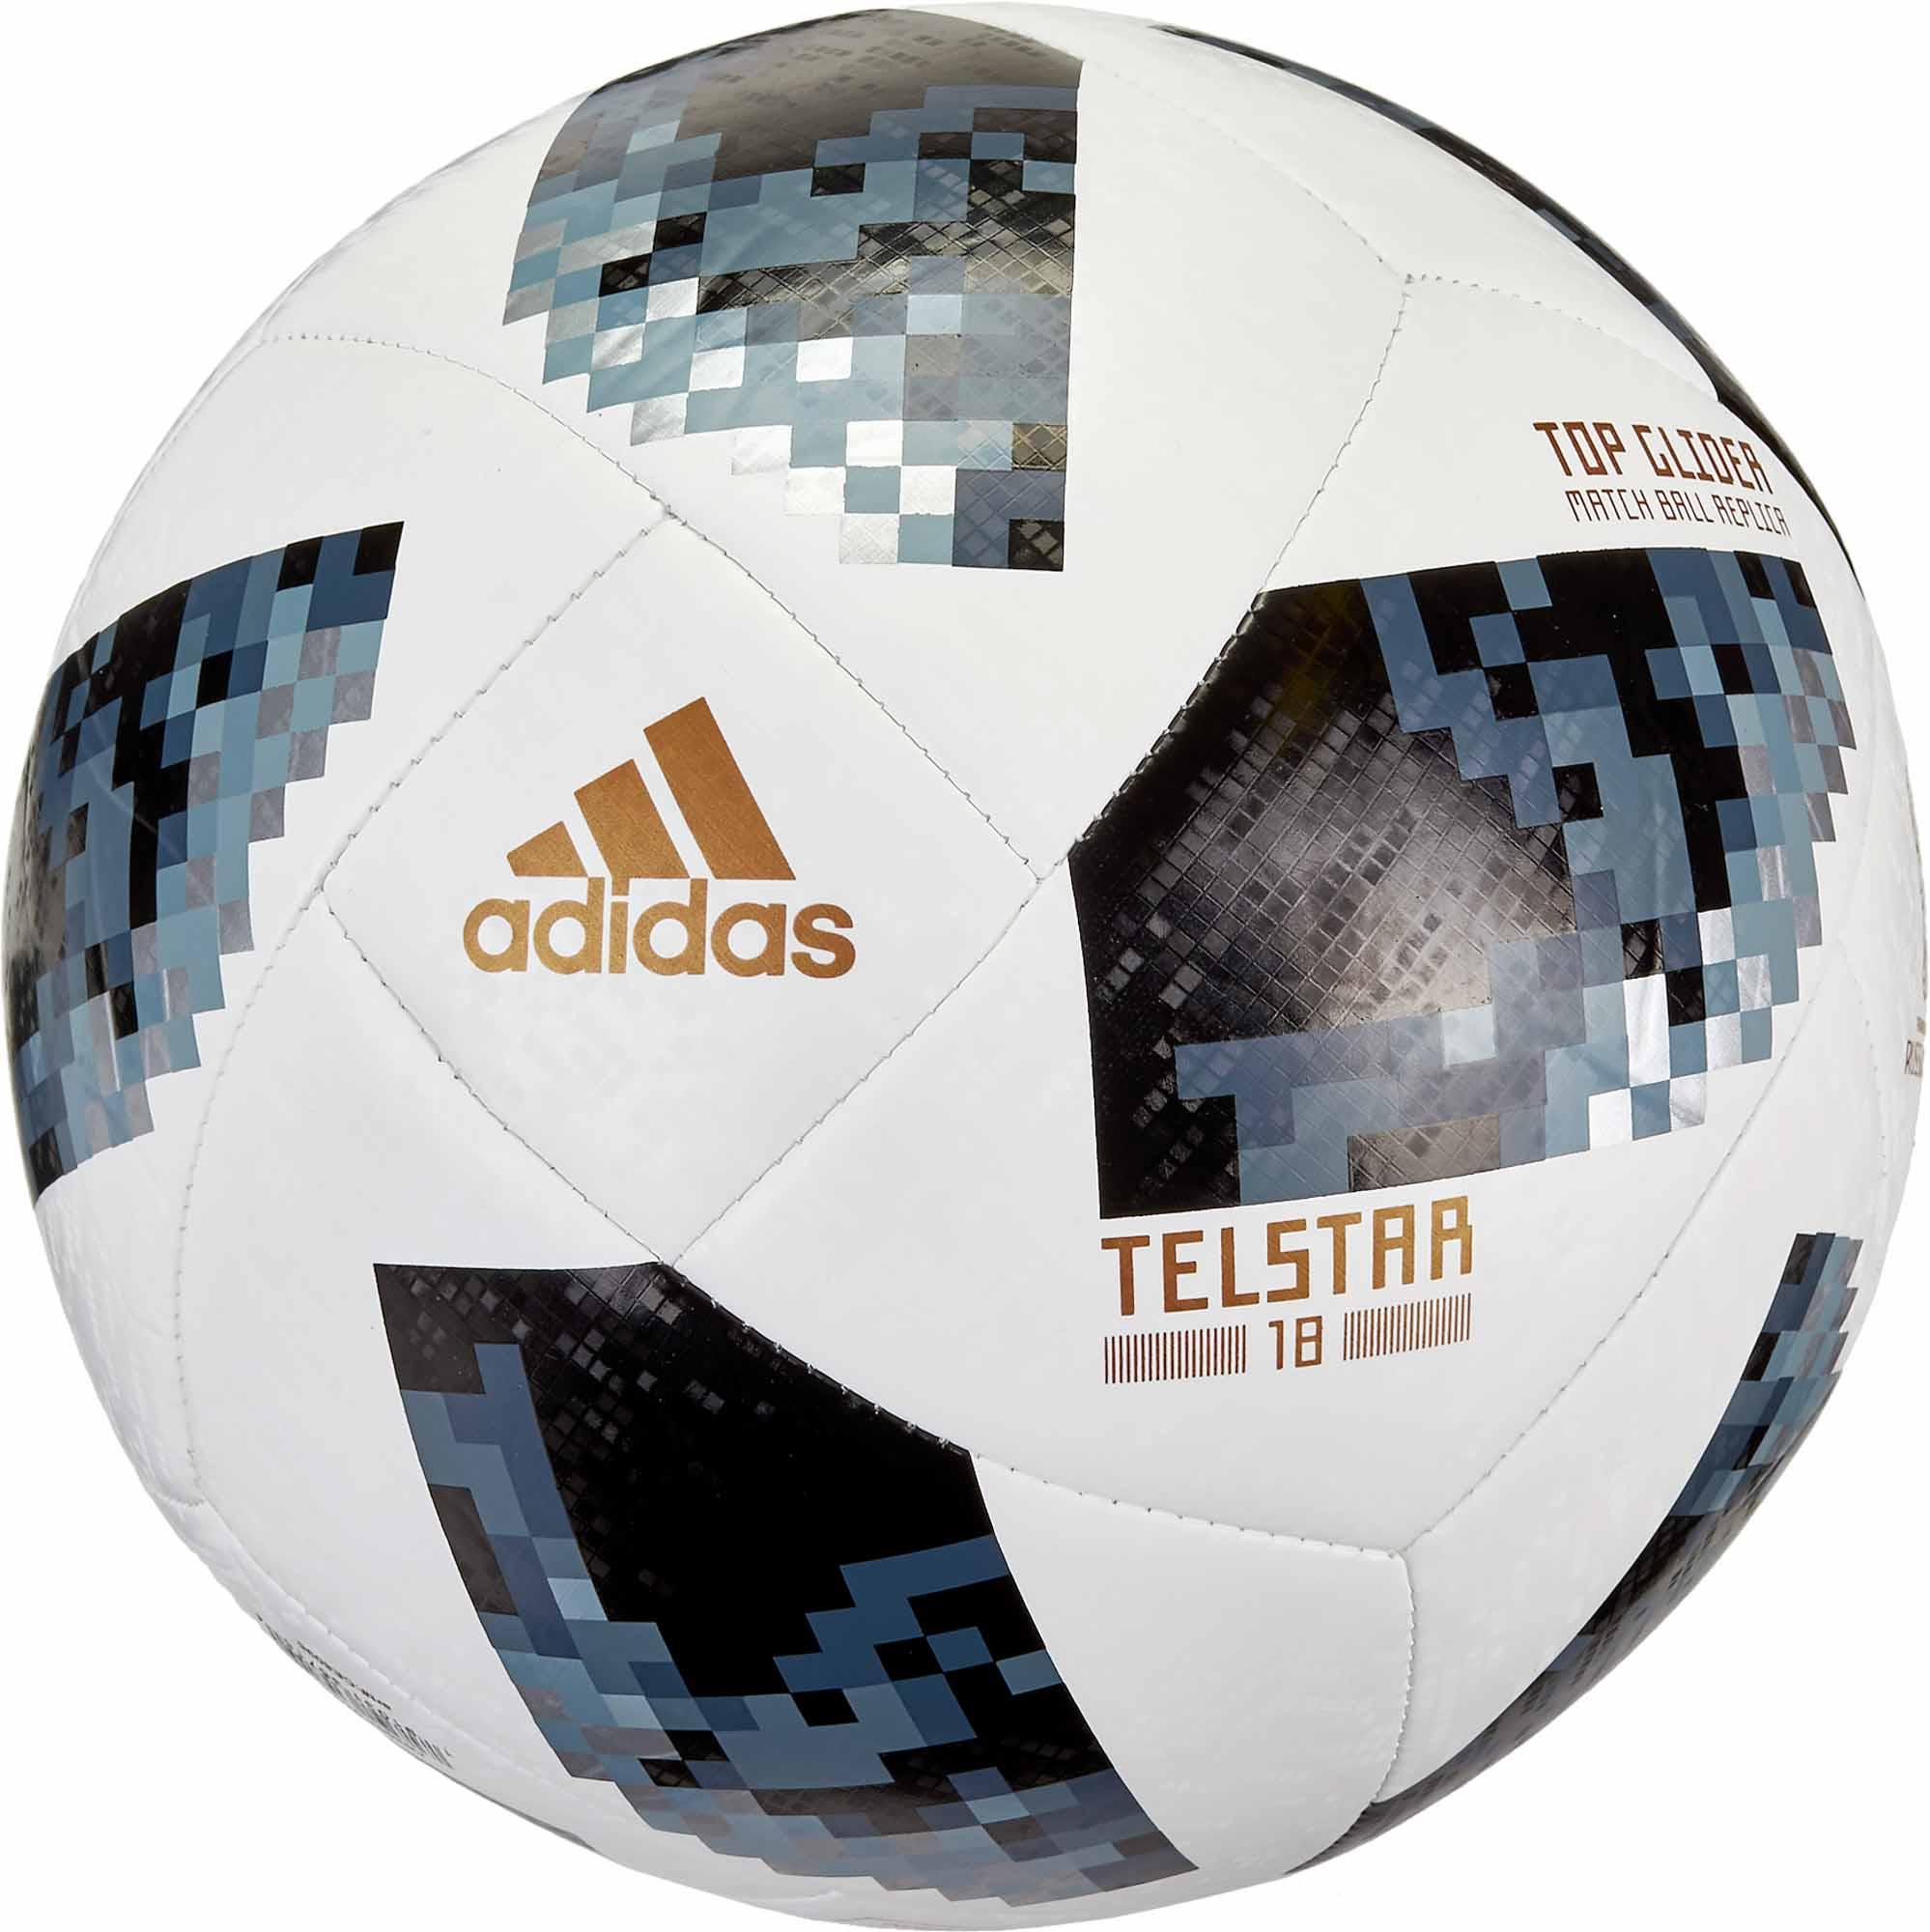 adidas Telstar 18 World Cup Top Glider Soccer Ball – White Metallic Silver 142942c44d